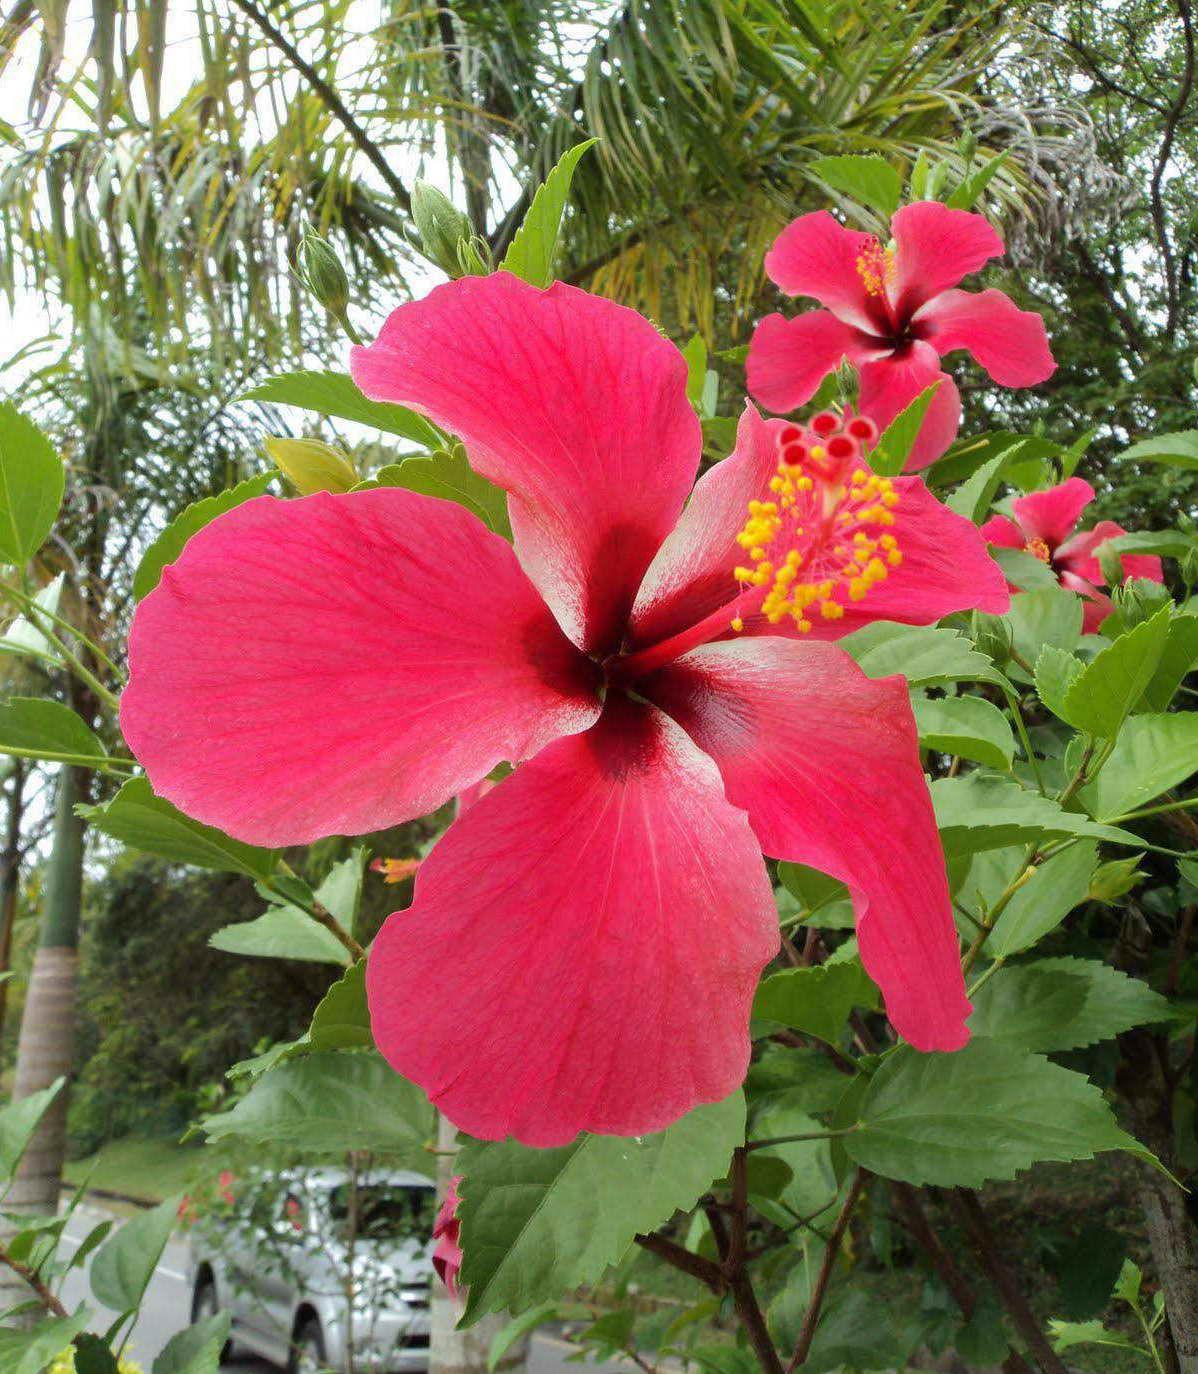 Red Hibiscus Flower Hibiscus Hibiscus Flowers Flowers